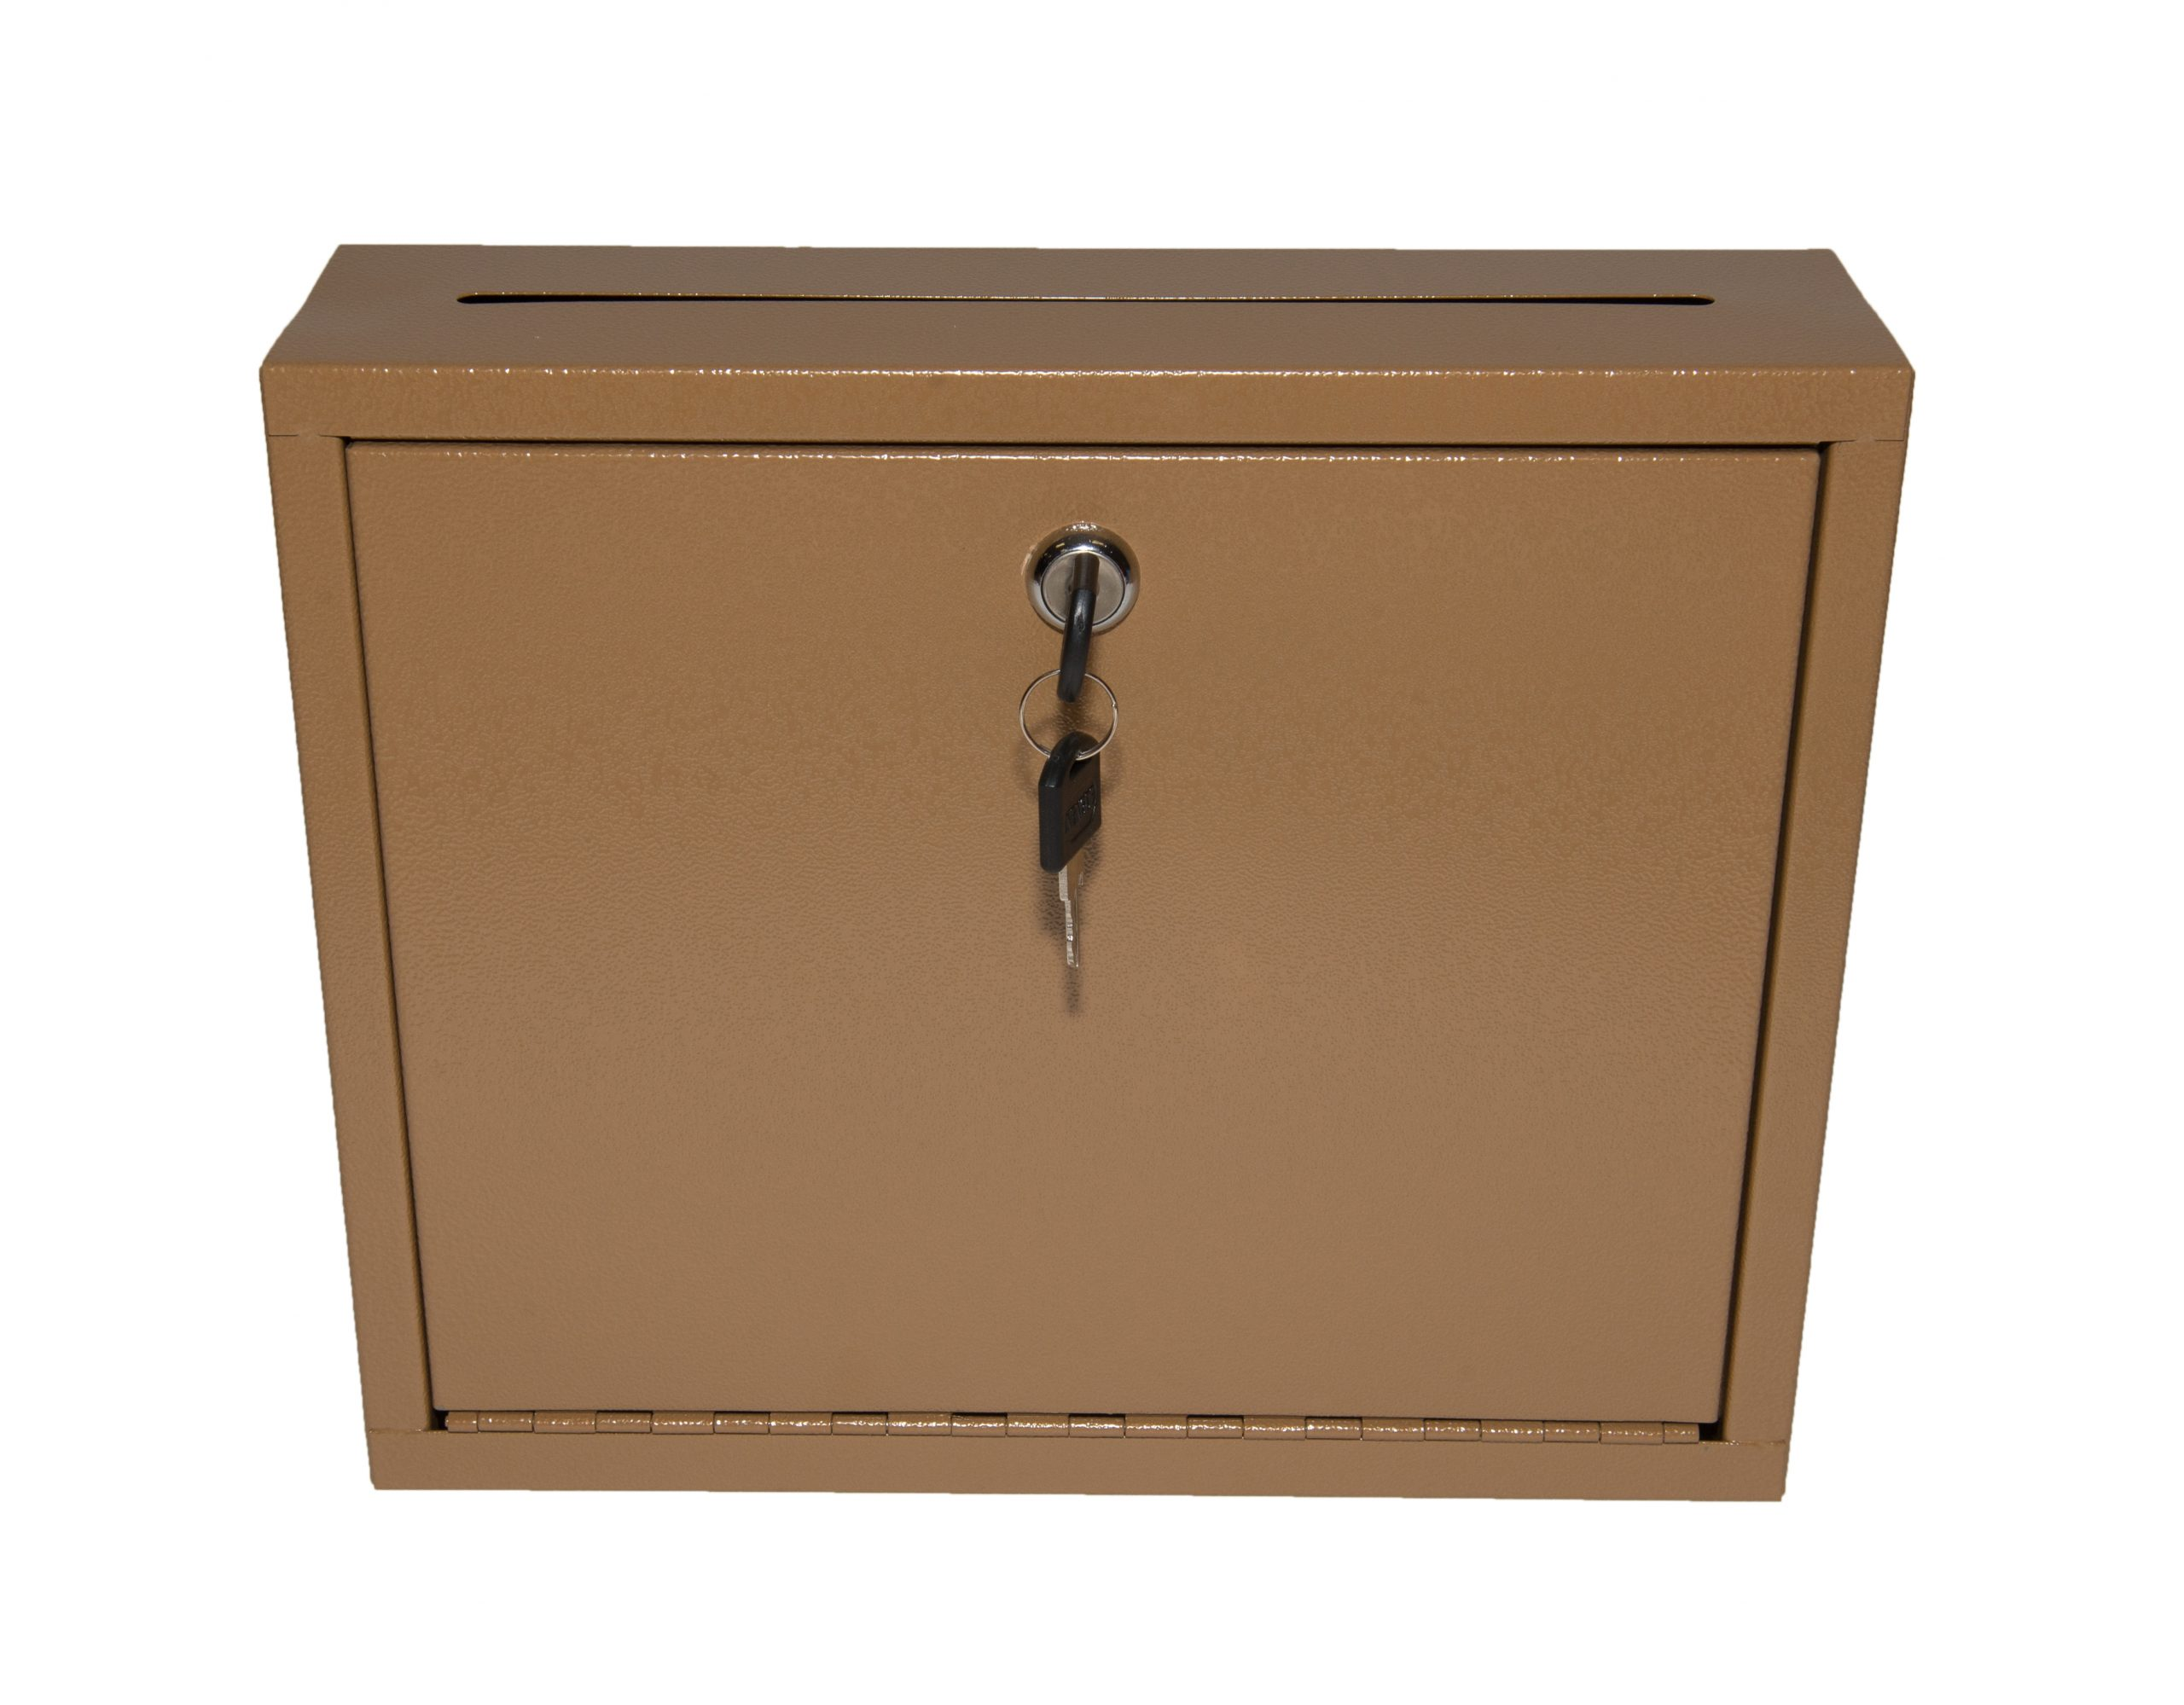 Steel Key Drop Box